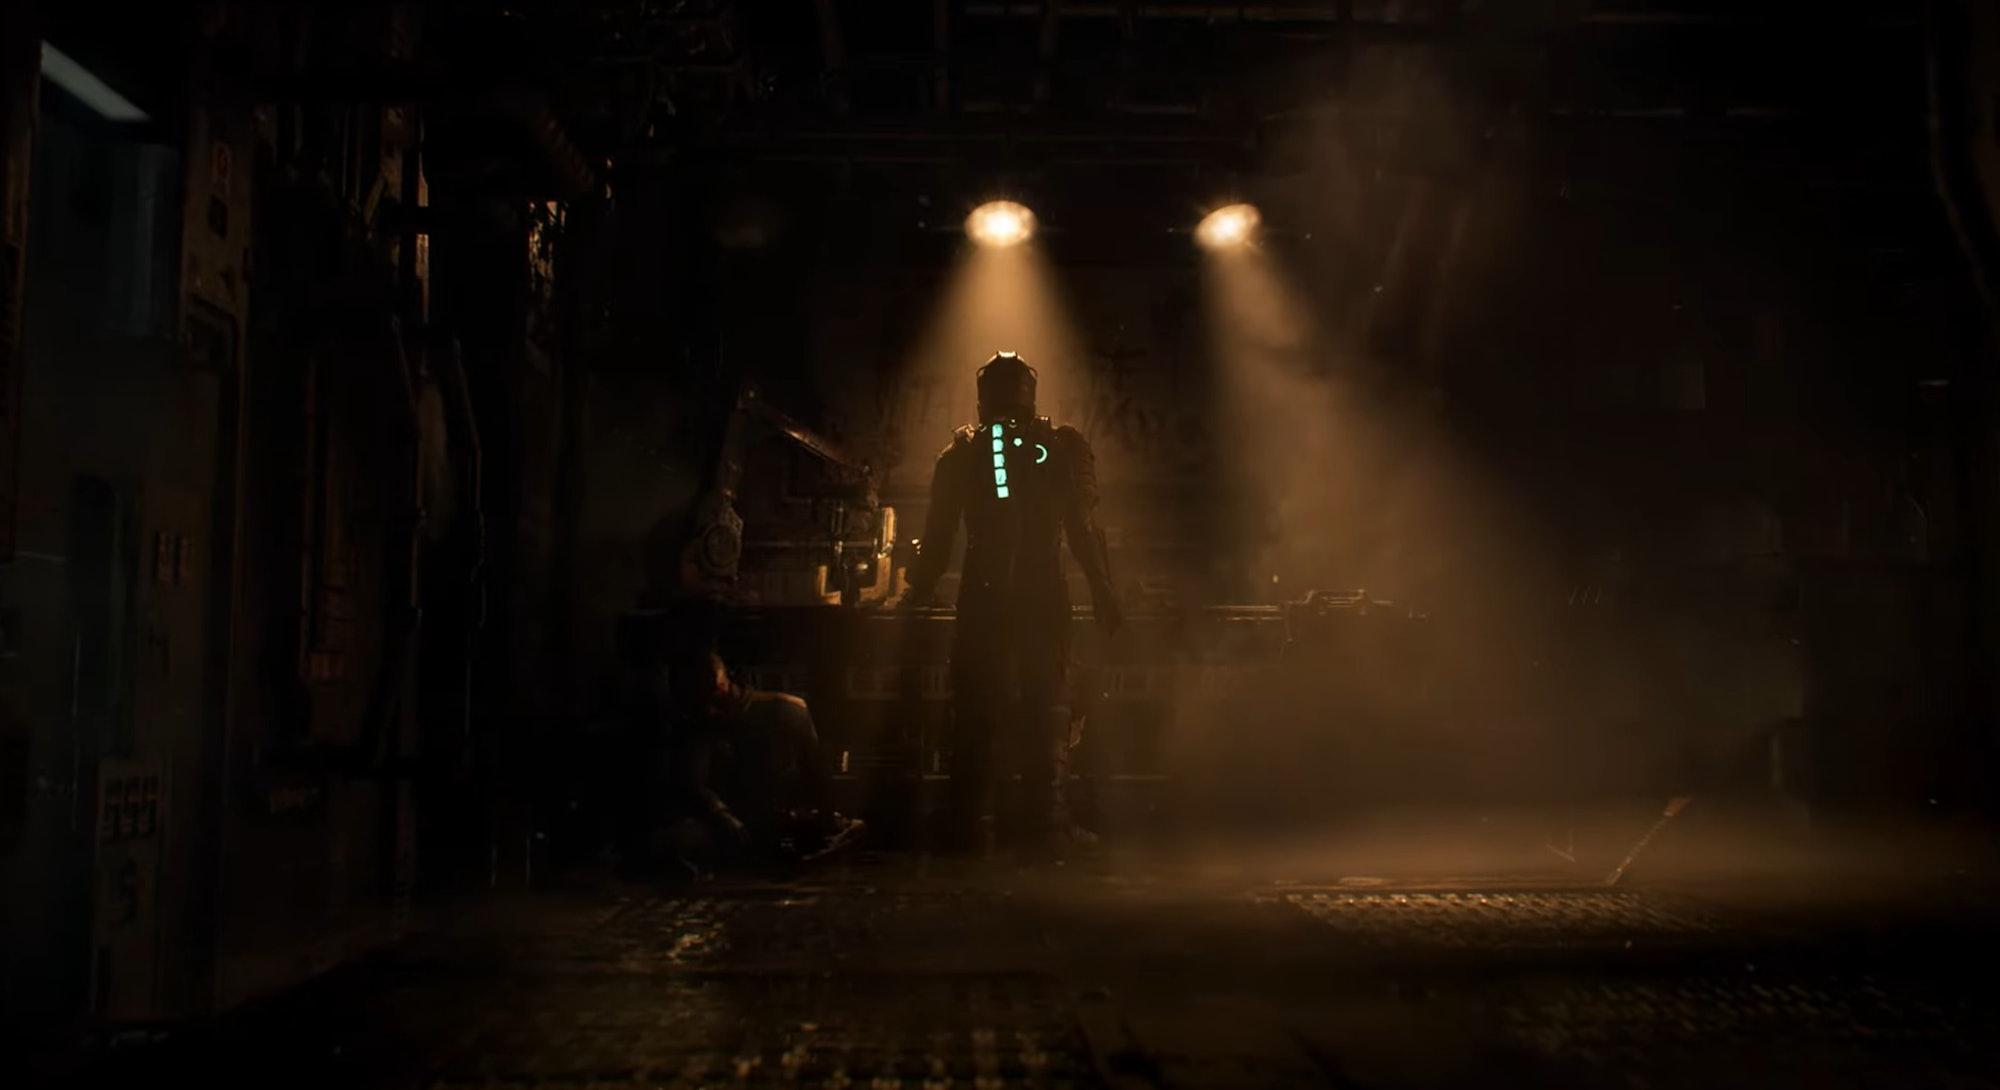 Issac Dead Space reveal trailer